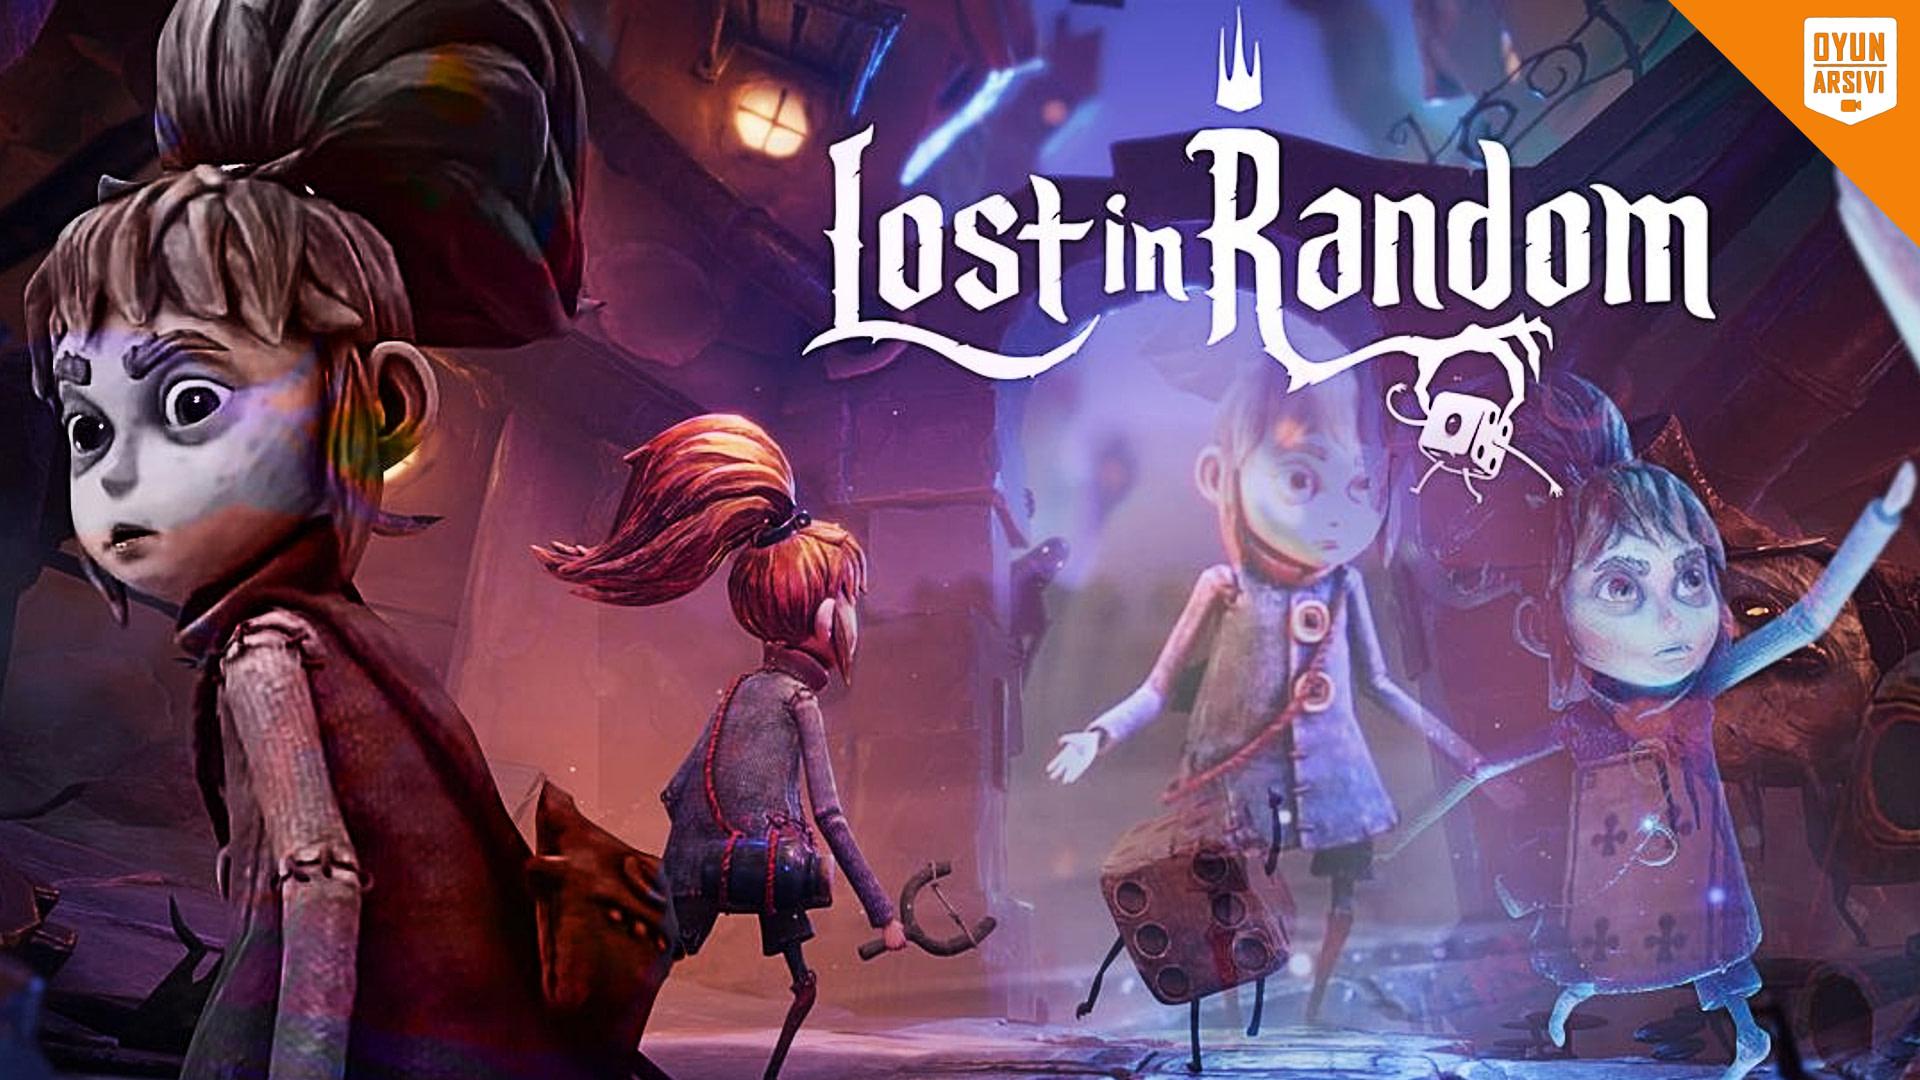 EA Originals Lost In Random Çıkış Tarihi Oyun Arşivi